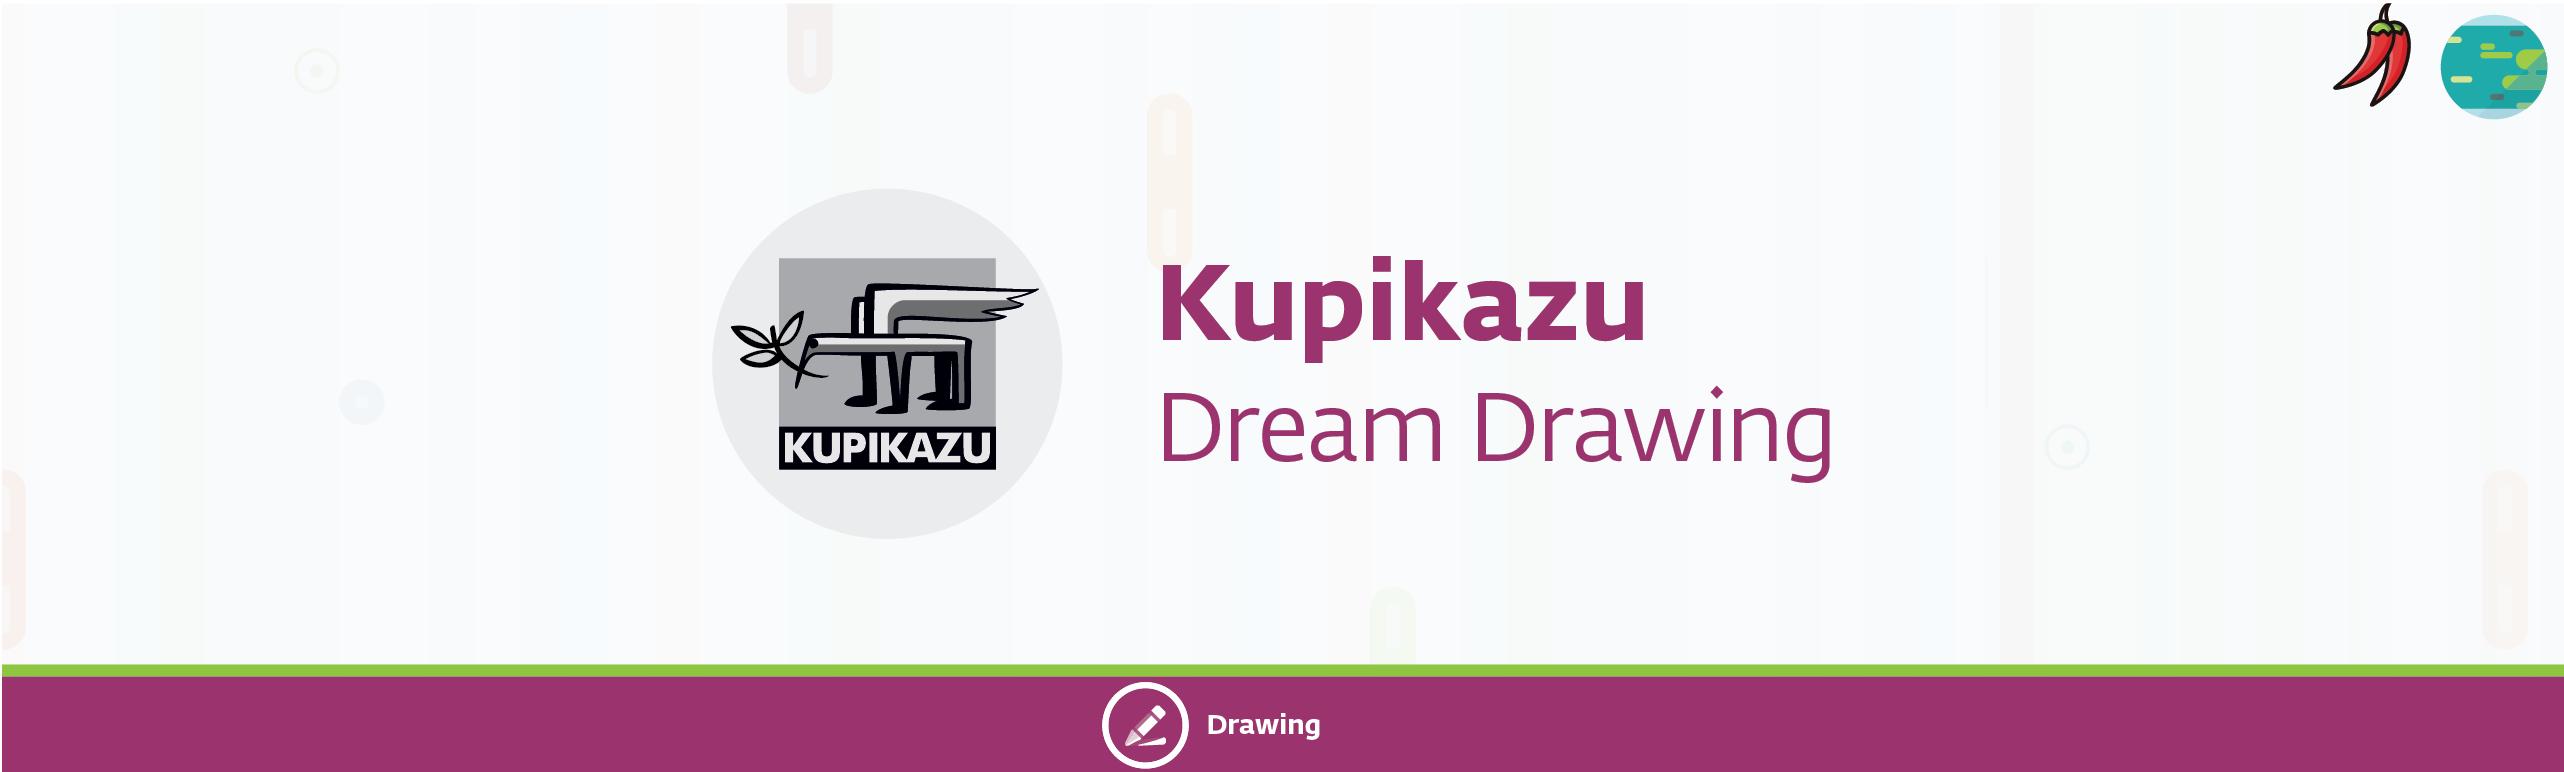 kupikazu 01 - Dream Drawing